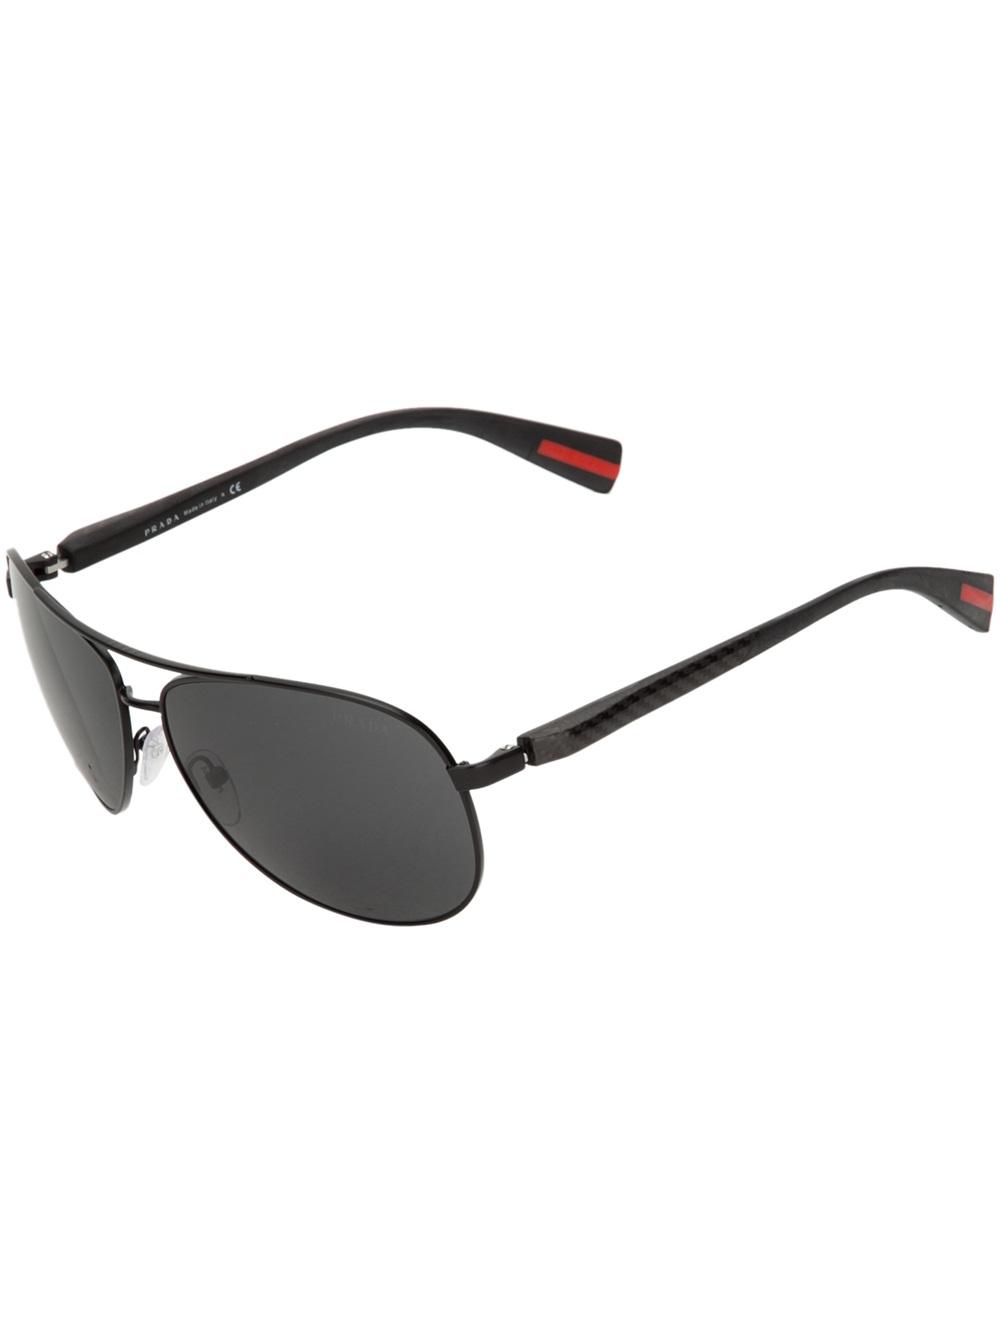 34c33e28bf8f Prada Aviator Sunglasses in Black for Men - Lyst